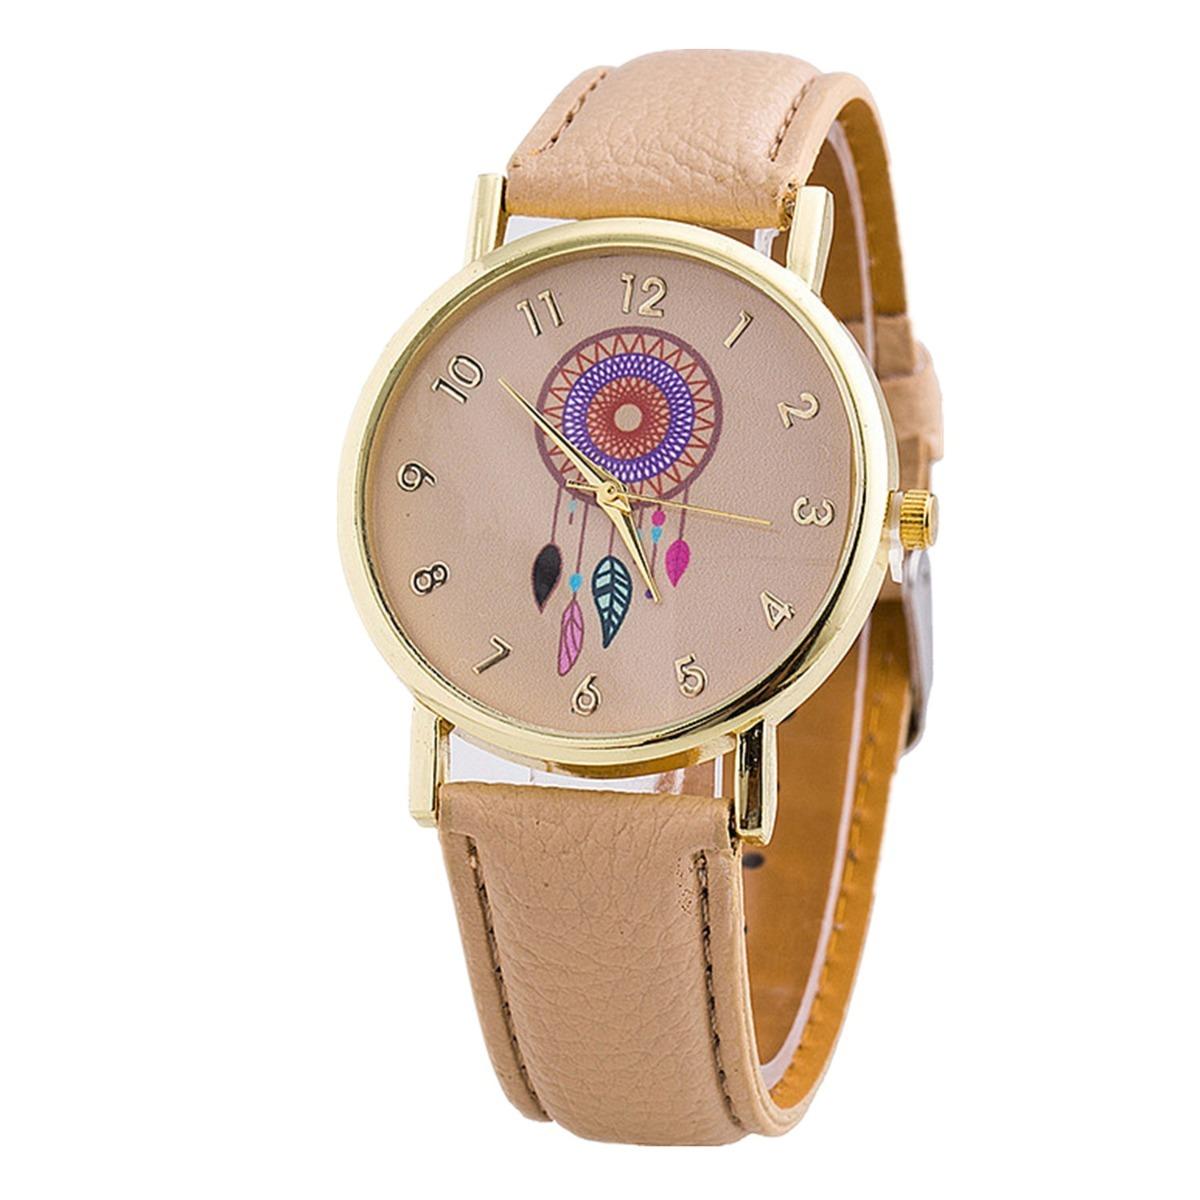 Reloj atrapasueños dama piel o tejido relojes moda cargando zoom jpg  1200x1200 Mercado libre tejido atrapasueños 0e21119465a2